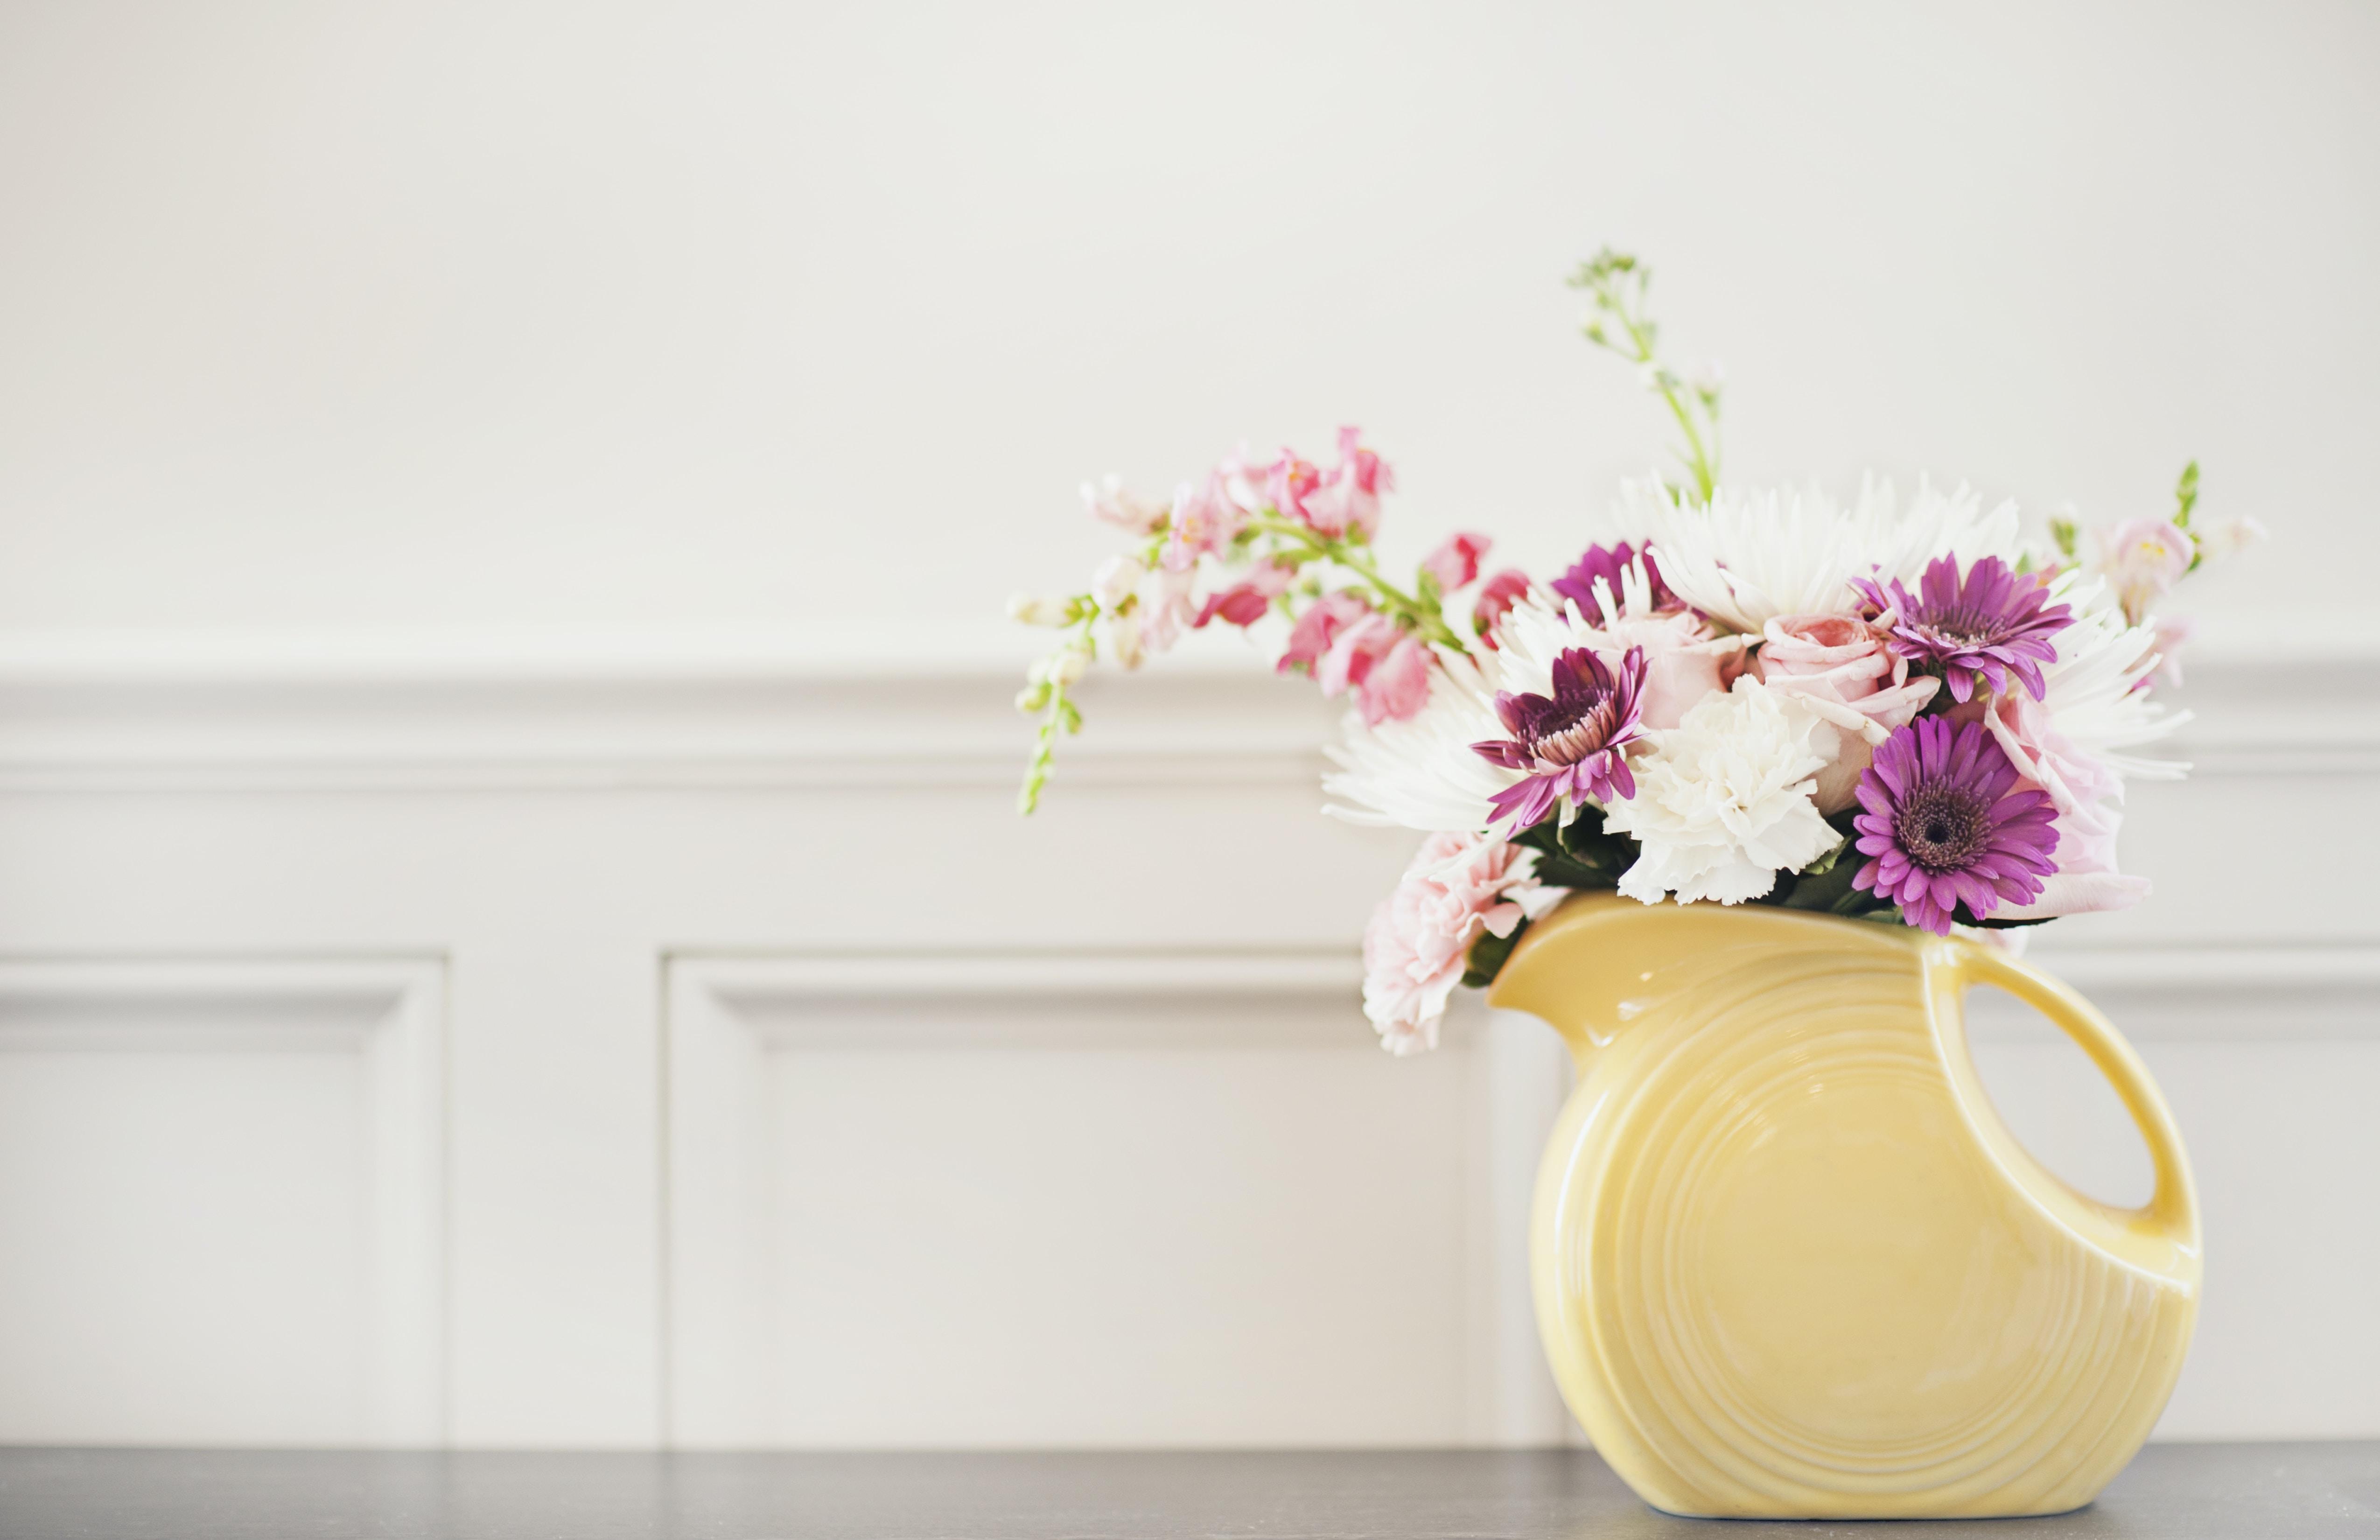 white and purple flowers on white ceramic vase